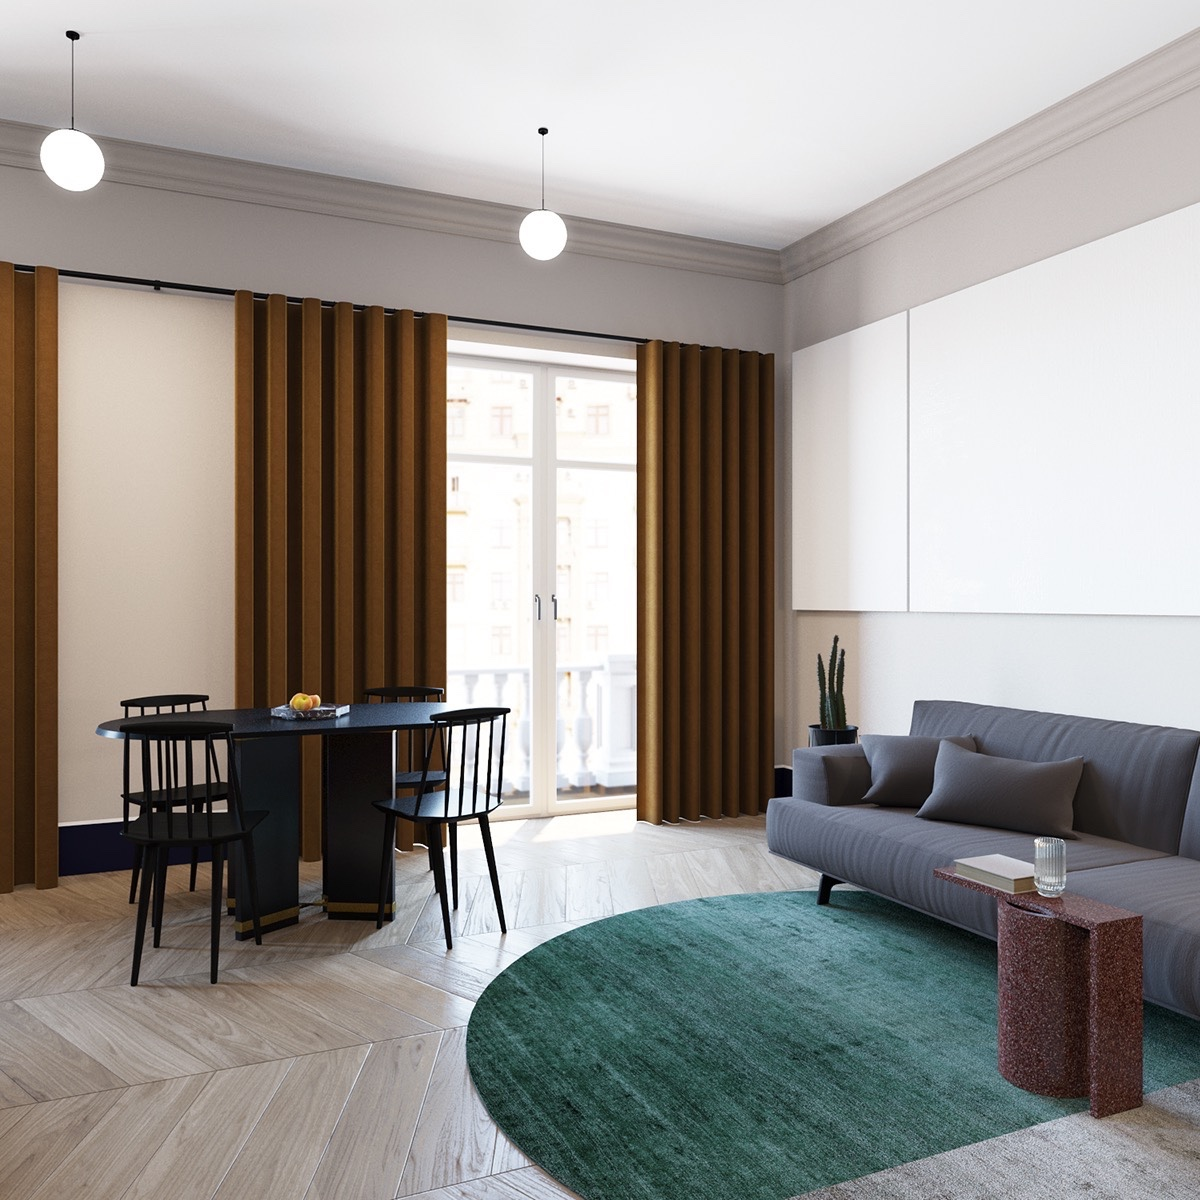 Unique Kitchen Storage Ideas Small Space Furniture: 600 Square Feet Apartment Design With Wonderful Maximalist